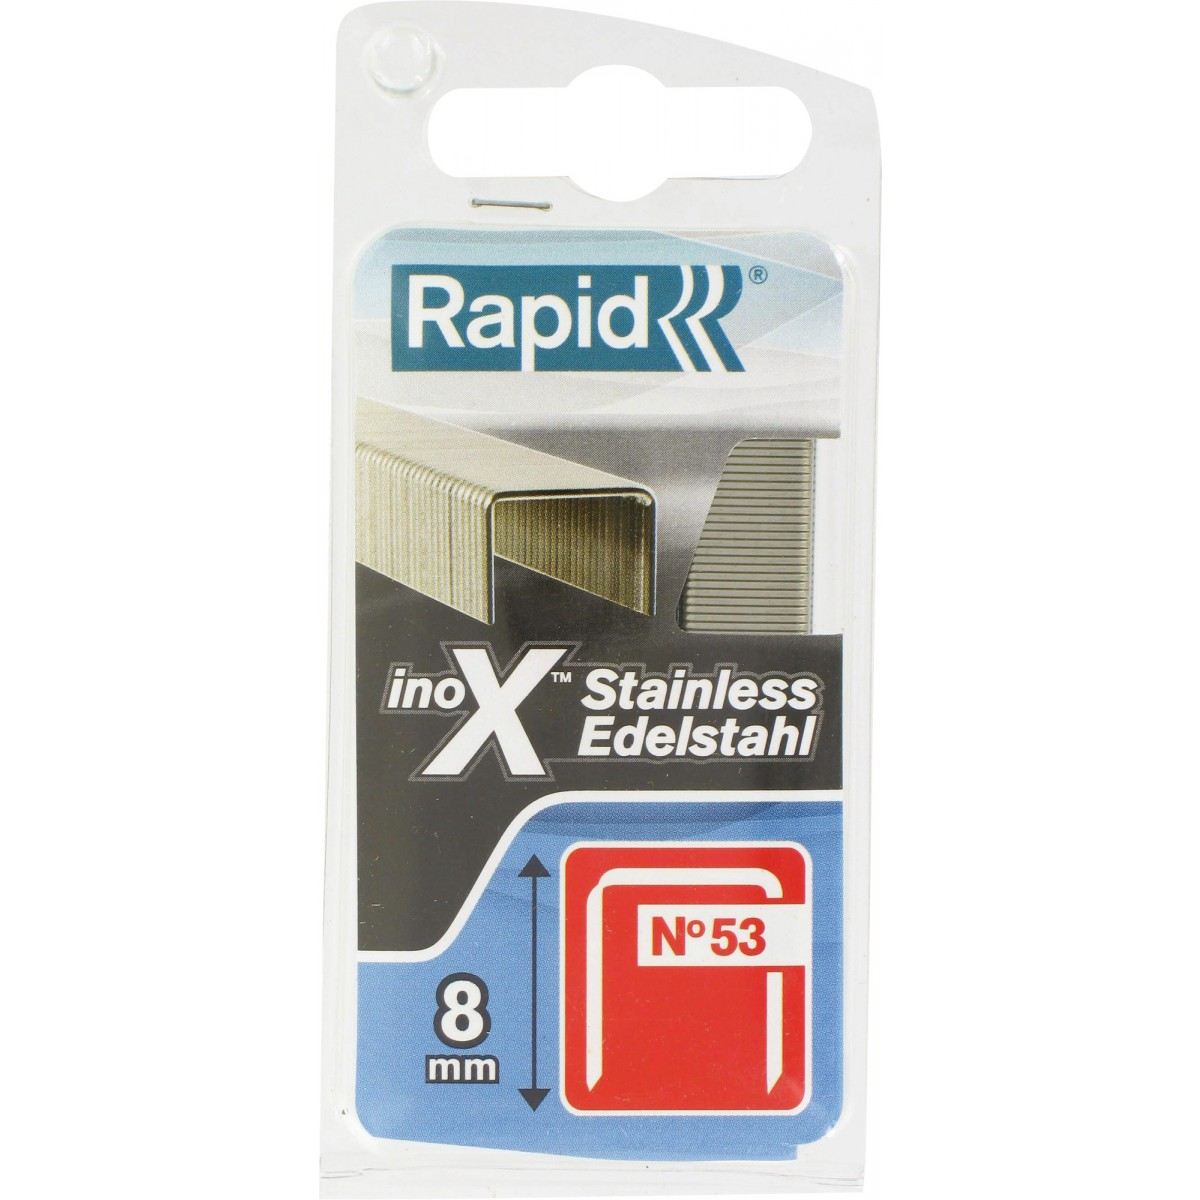 Agrafe inox n°53 Rapid Agraf - Hauteur 8 mm - 1080 agrafes